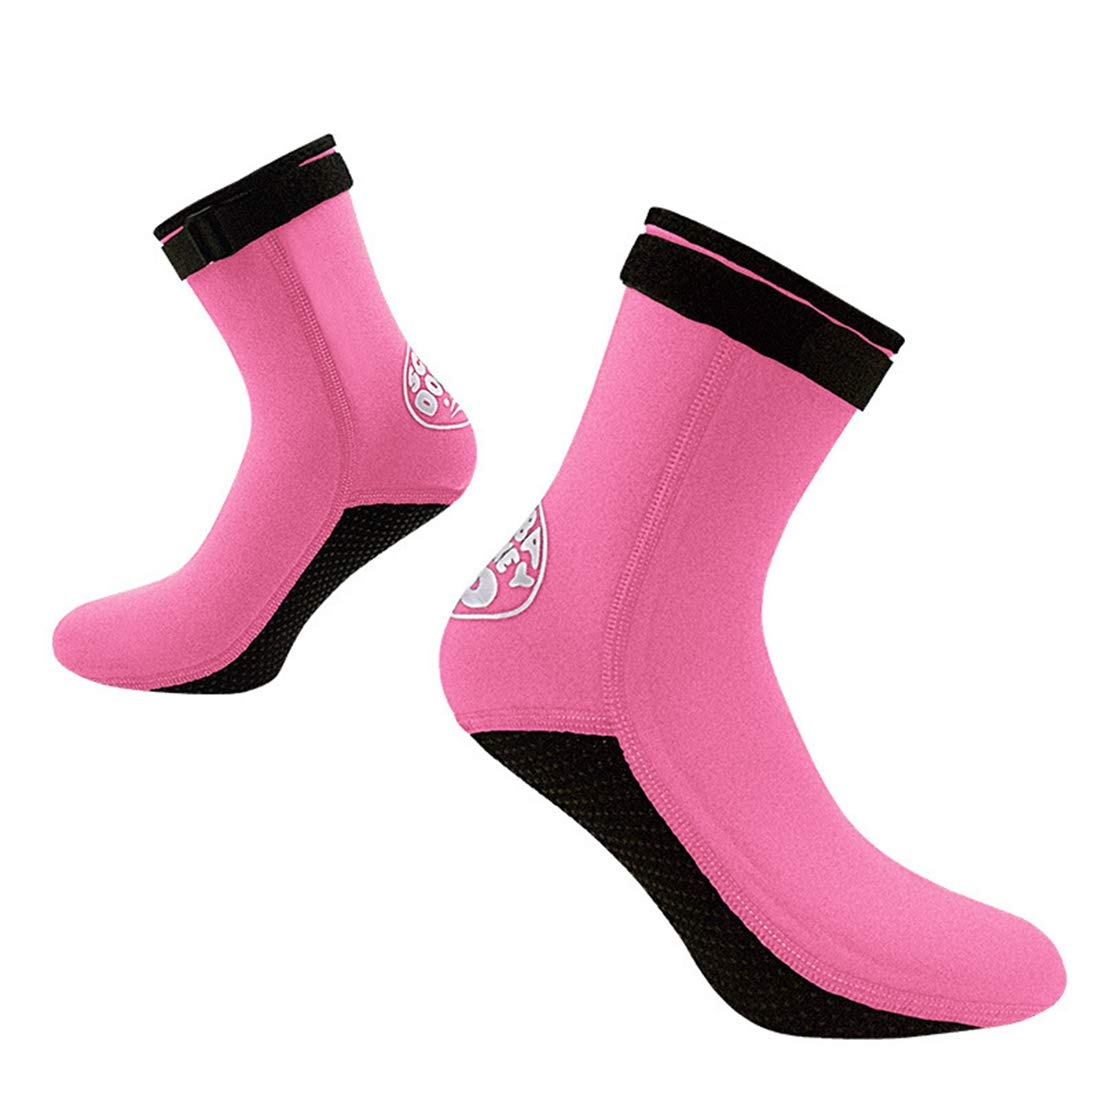 Oraunent Neoprene Socks Snorkeling Beach Socks for Water Sports Diving Swimming Fishing Black XS